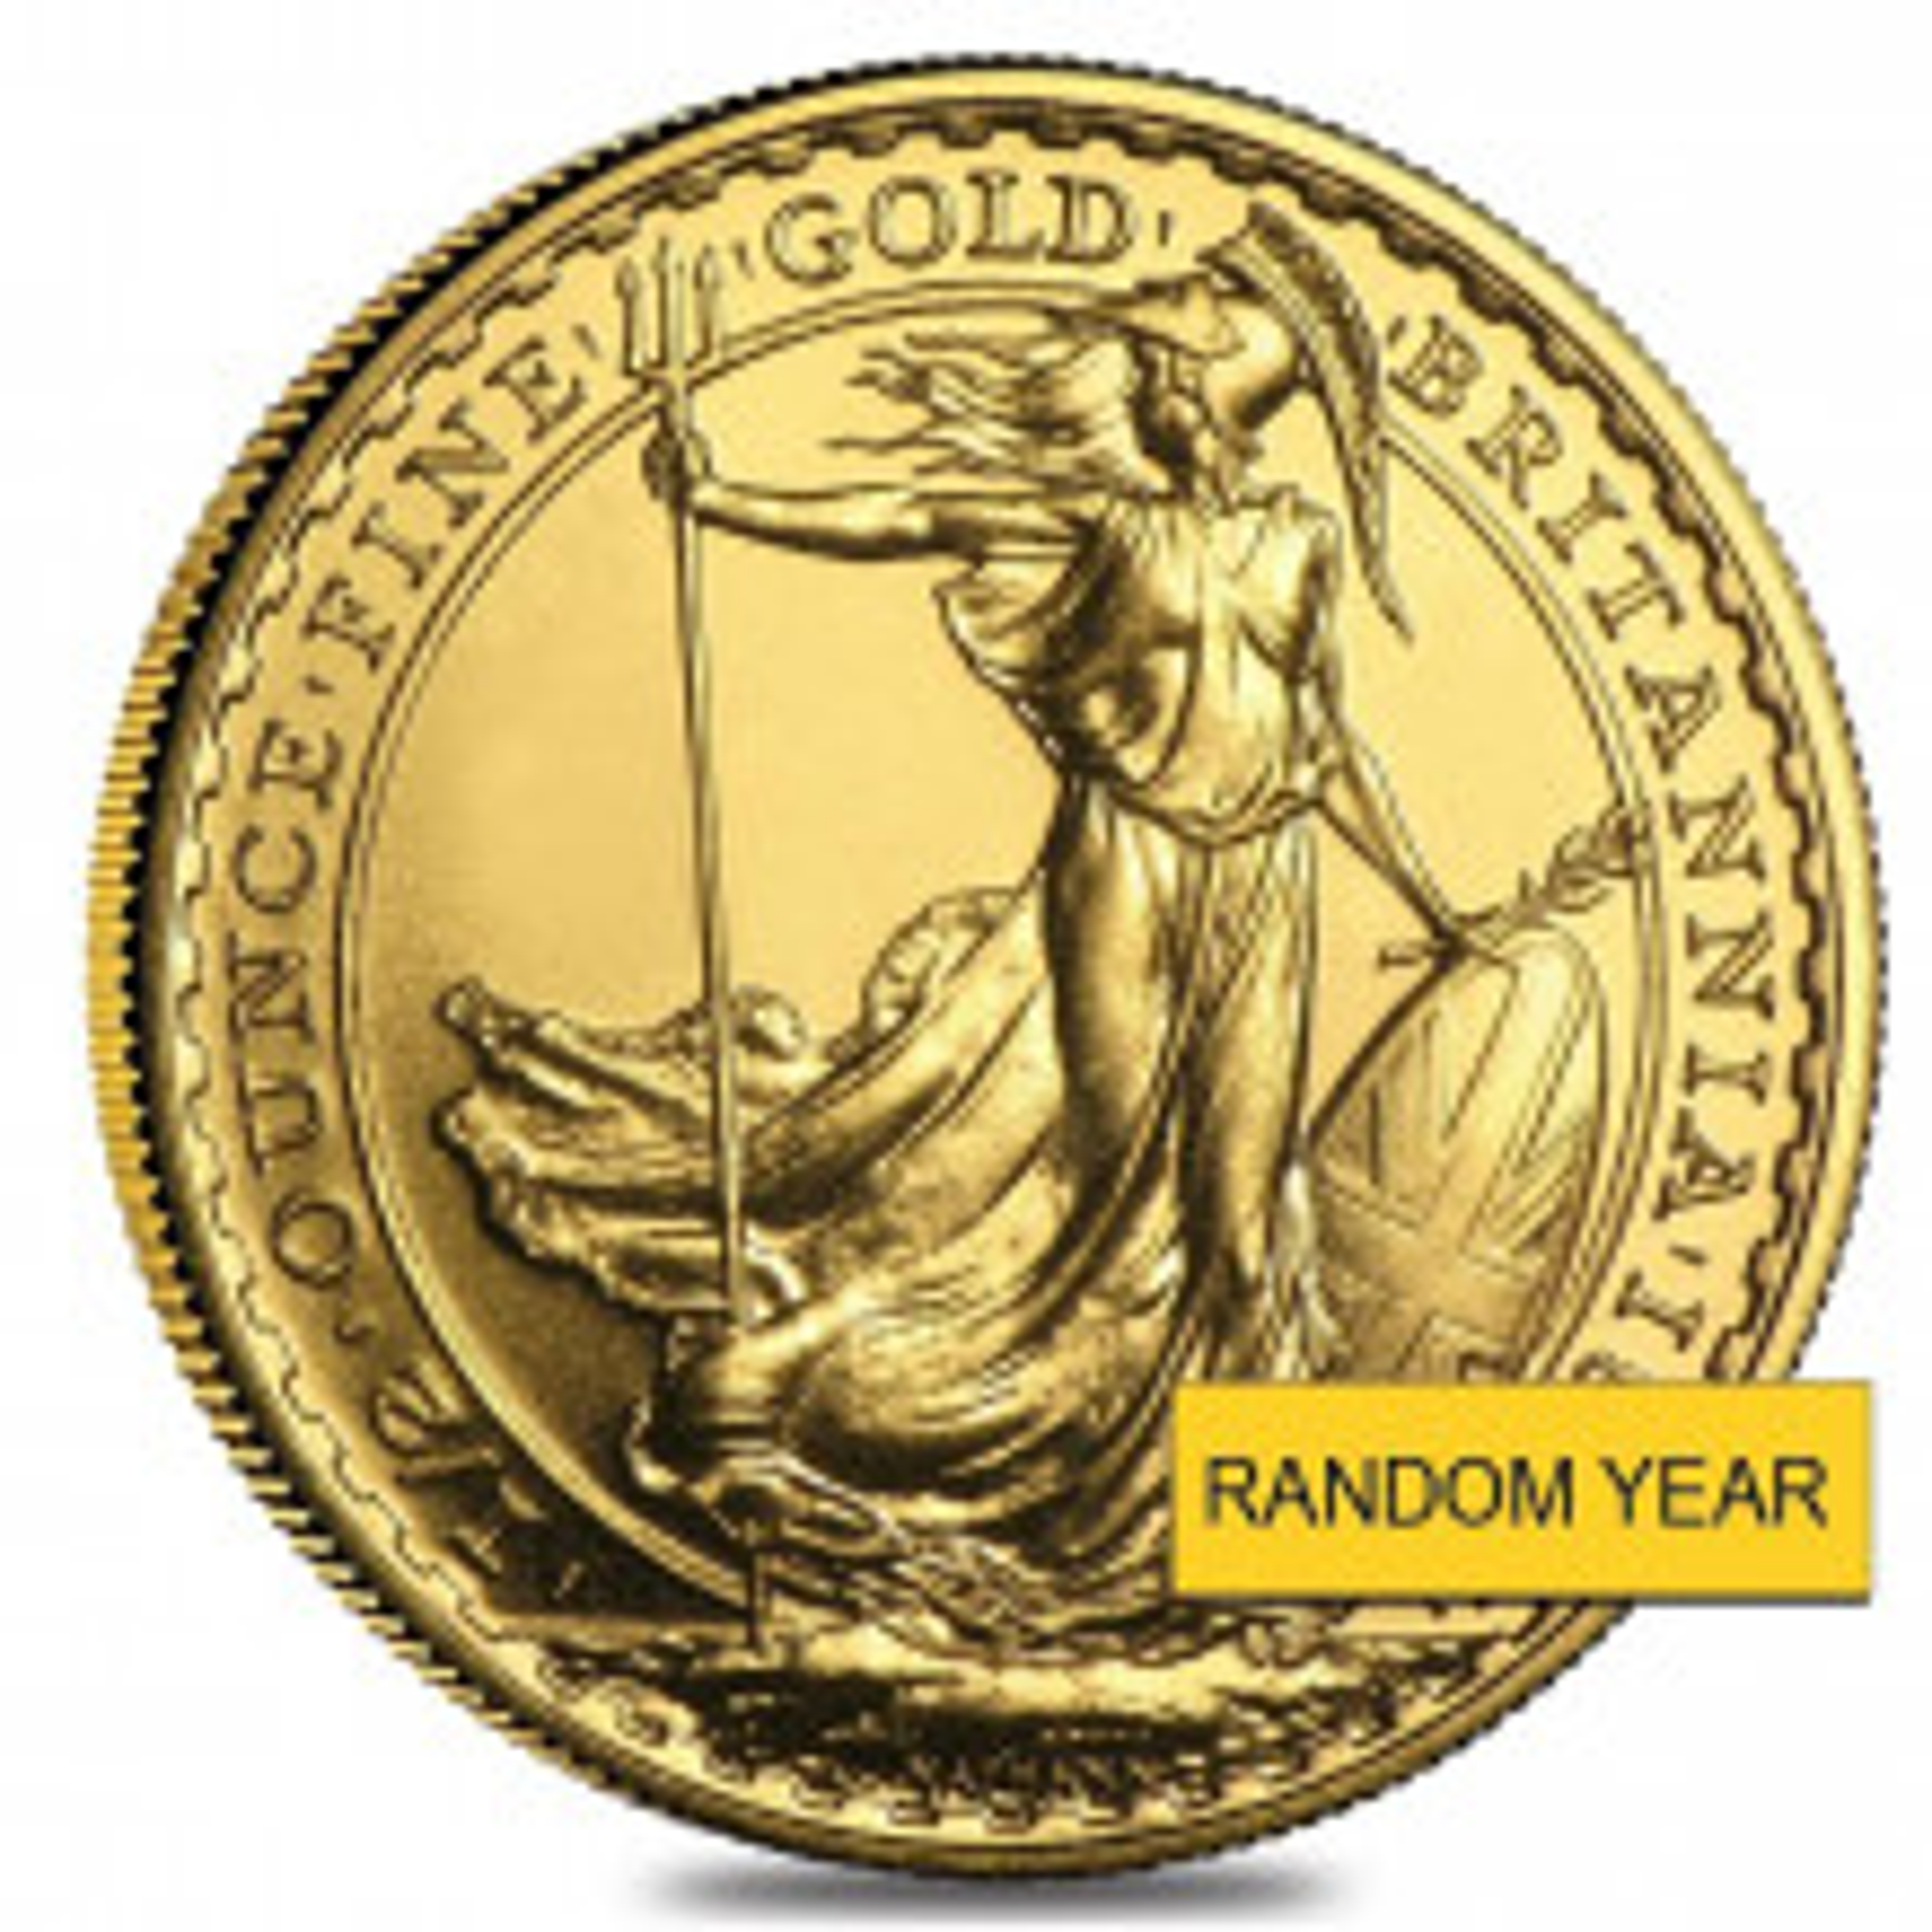 1/2 Troy ounce gold coin Britannia